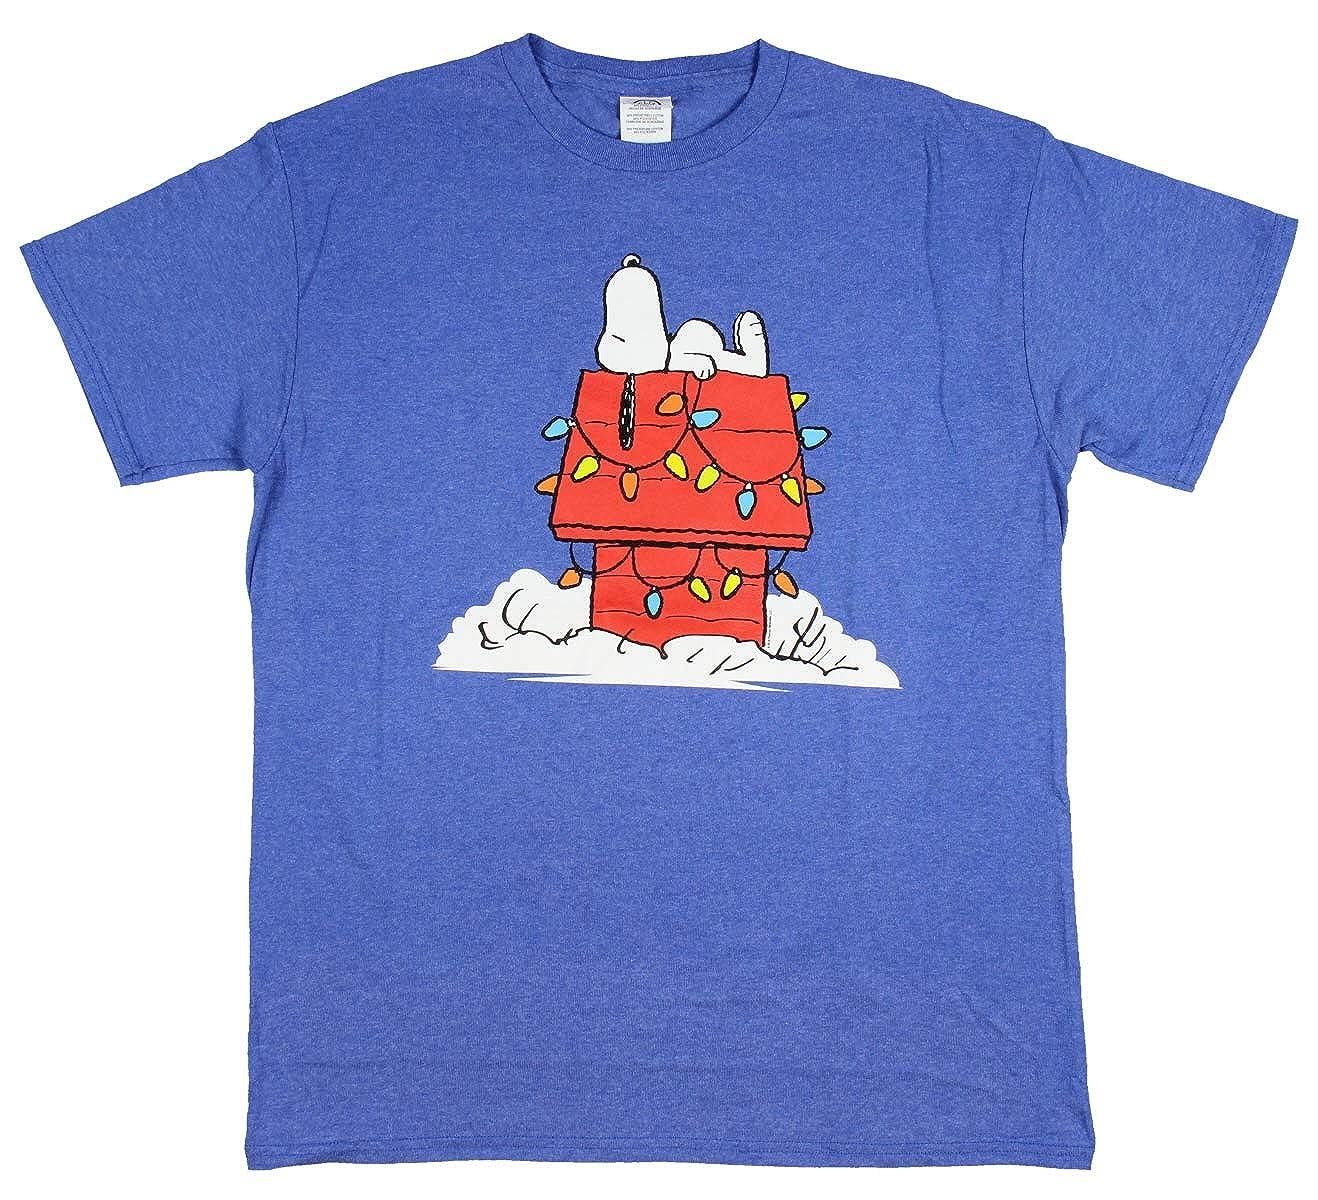 Peanuts Snoopy Shirt Christmas Lights On Doghouse Adult S Tshirt